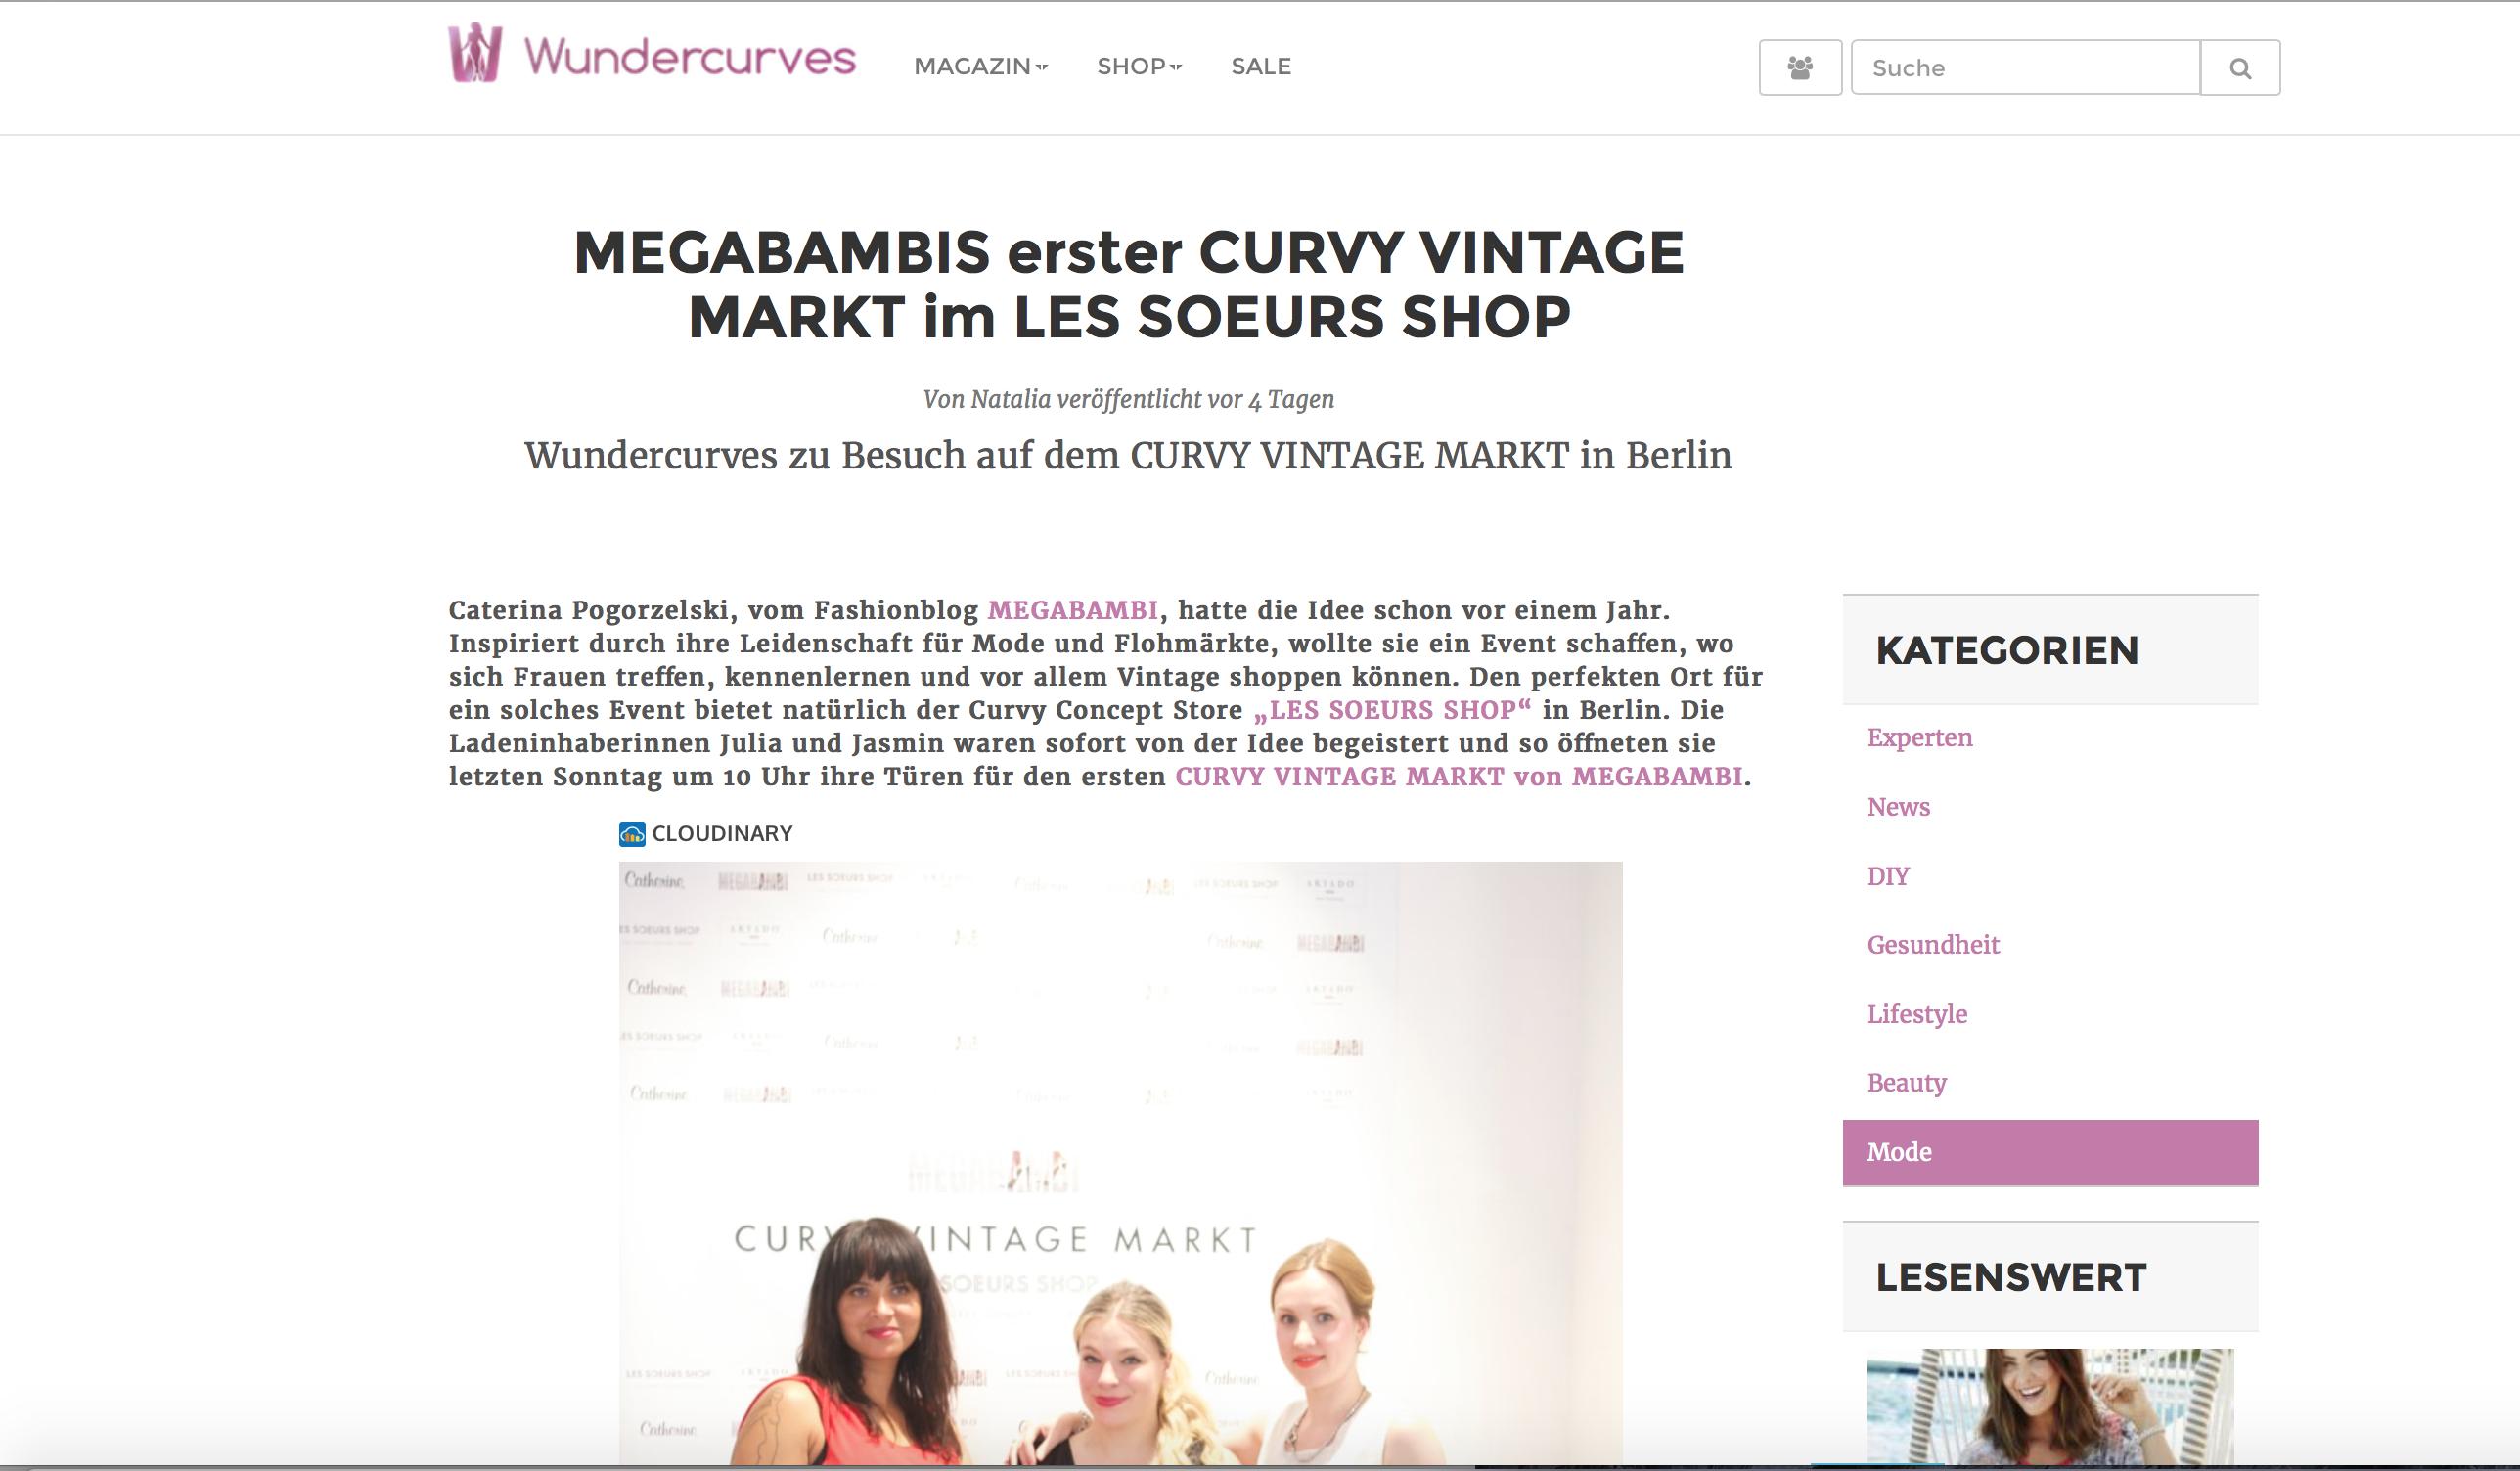 Megabambi-Curvy-Vintage-Markt-Flohmarkt-Caterina-Pogorzelski-caterina-pogorzelski